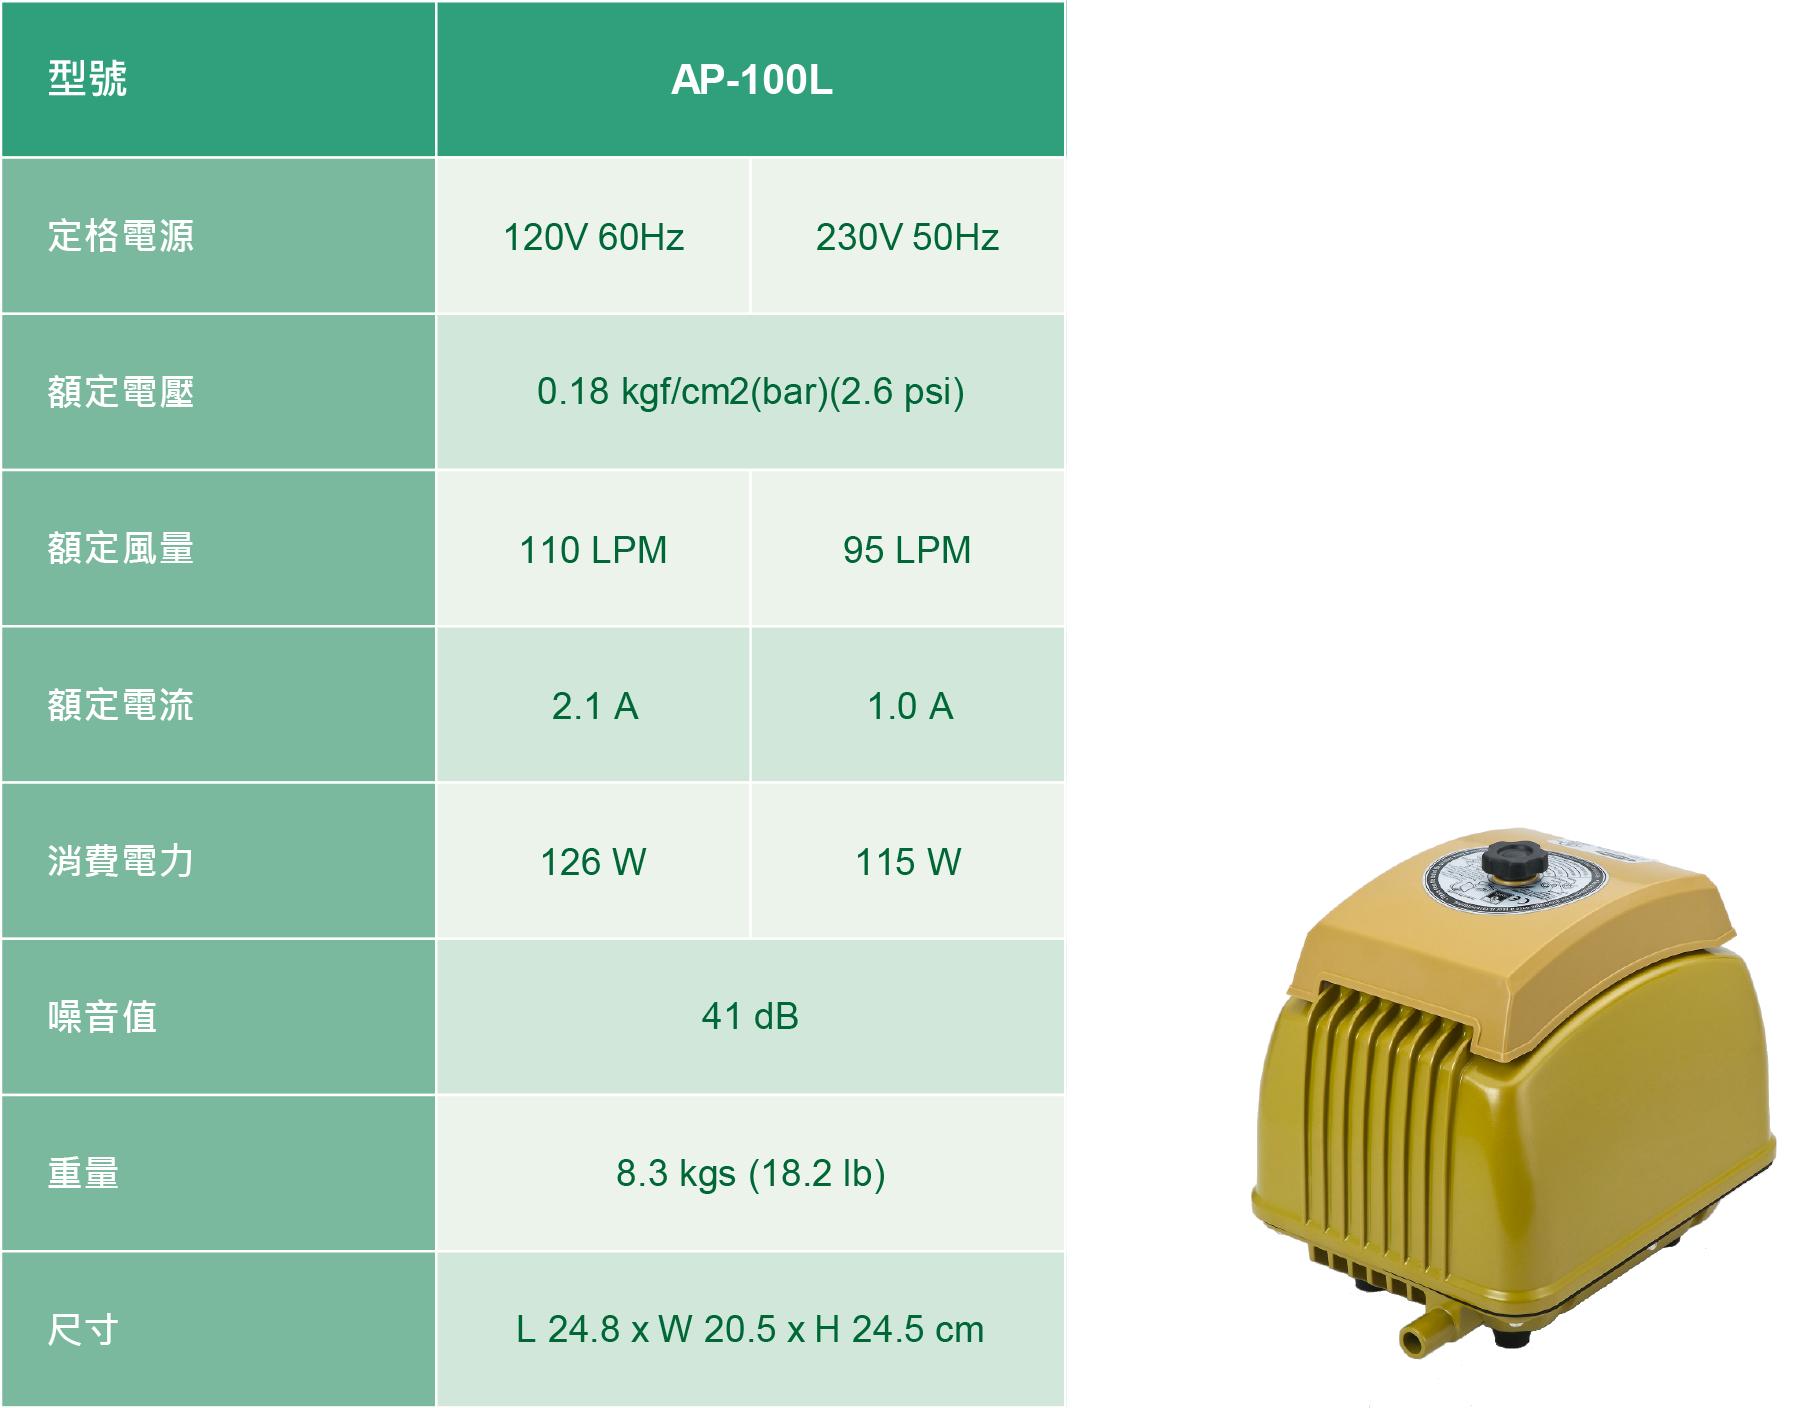 Linear Air Pumps AP-100L Performance